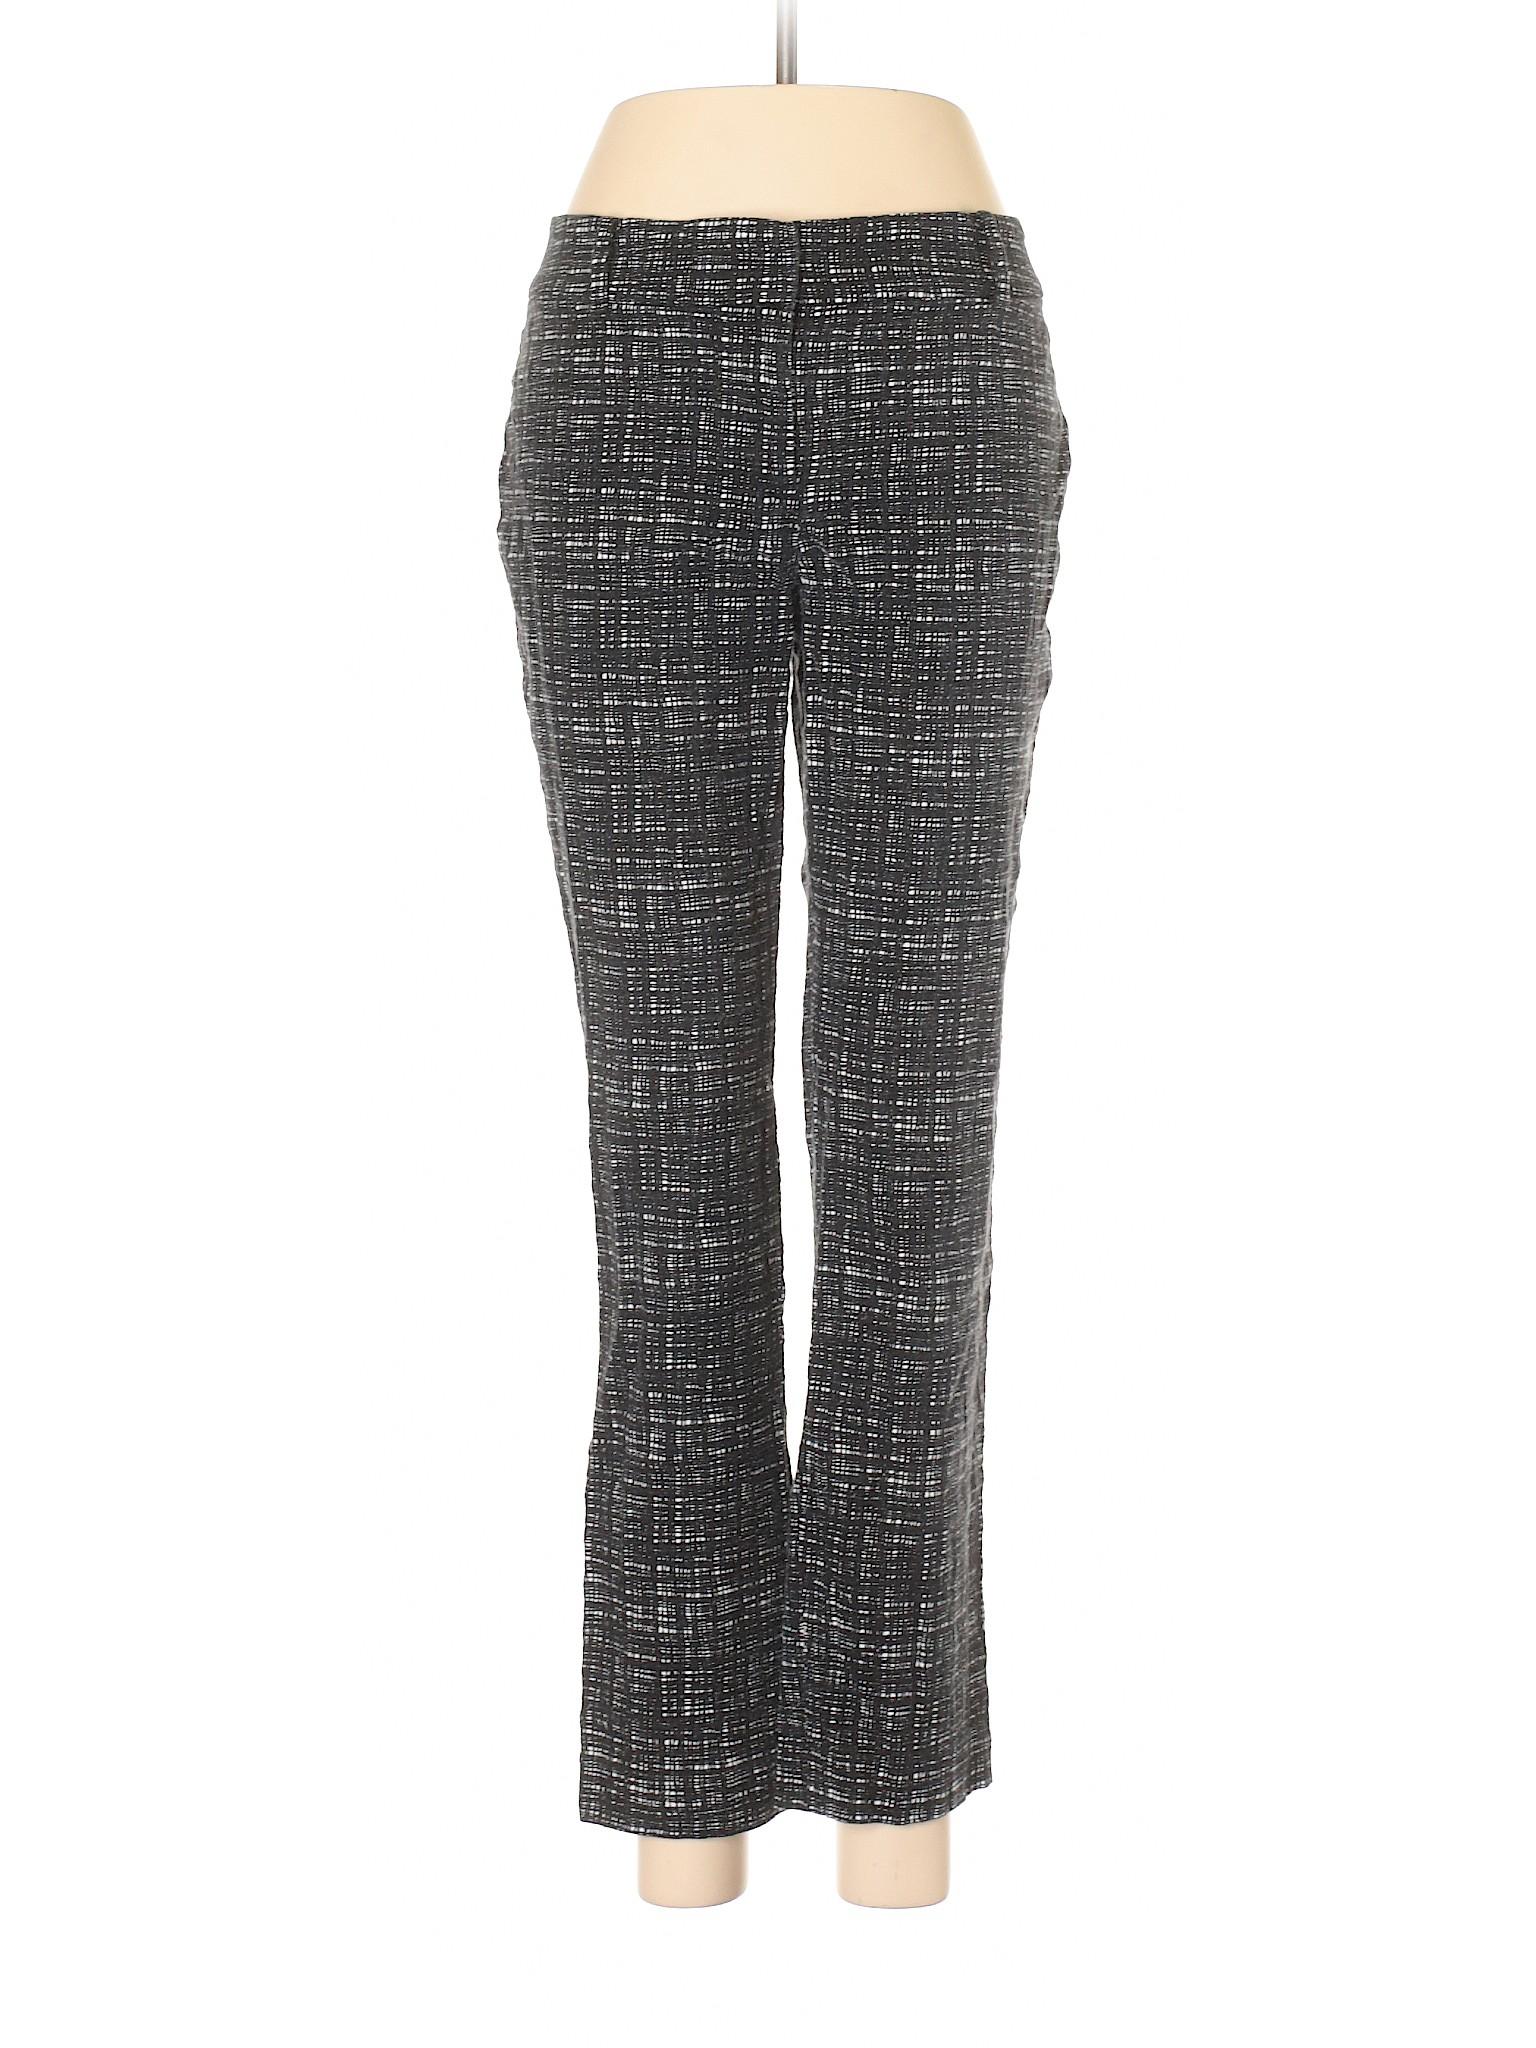 Casual Pants Taylor Ann Winter Boutique vwq0tYv